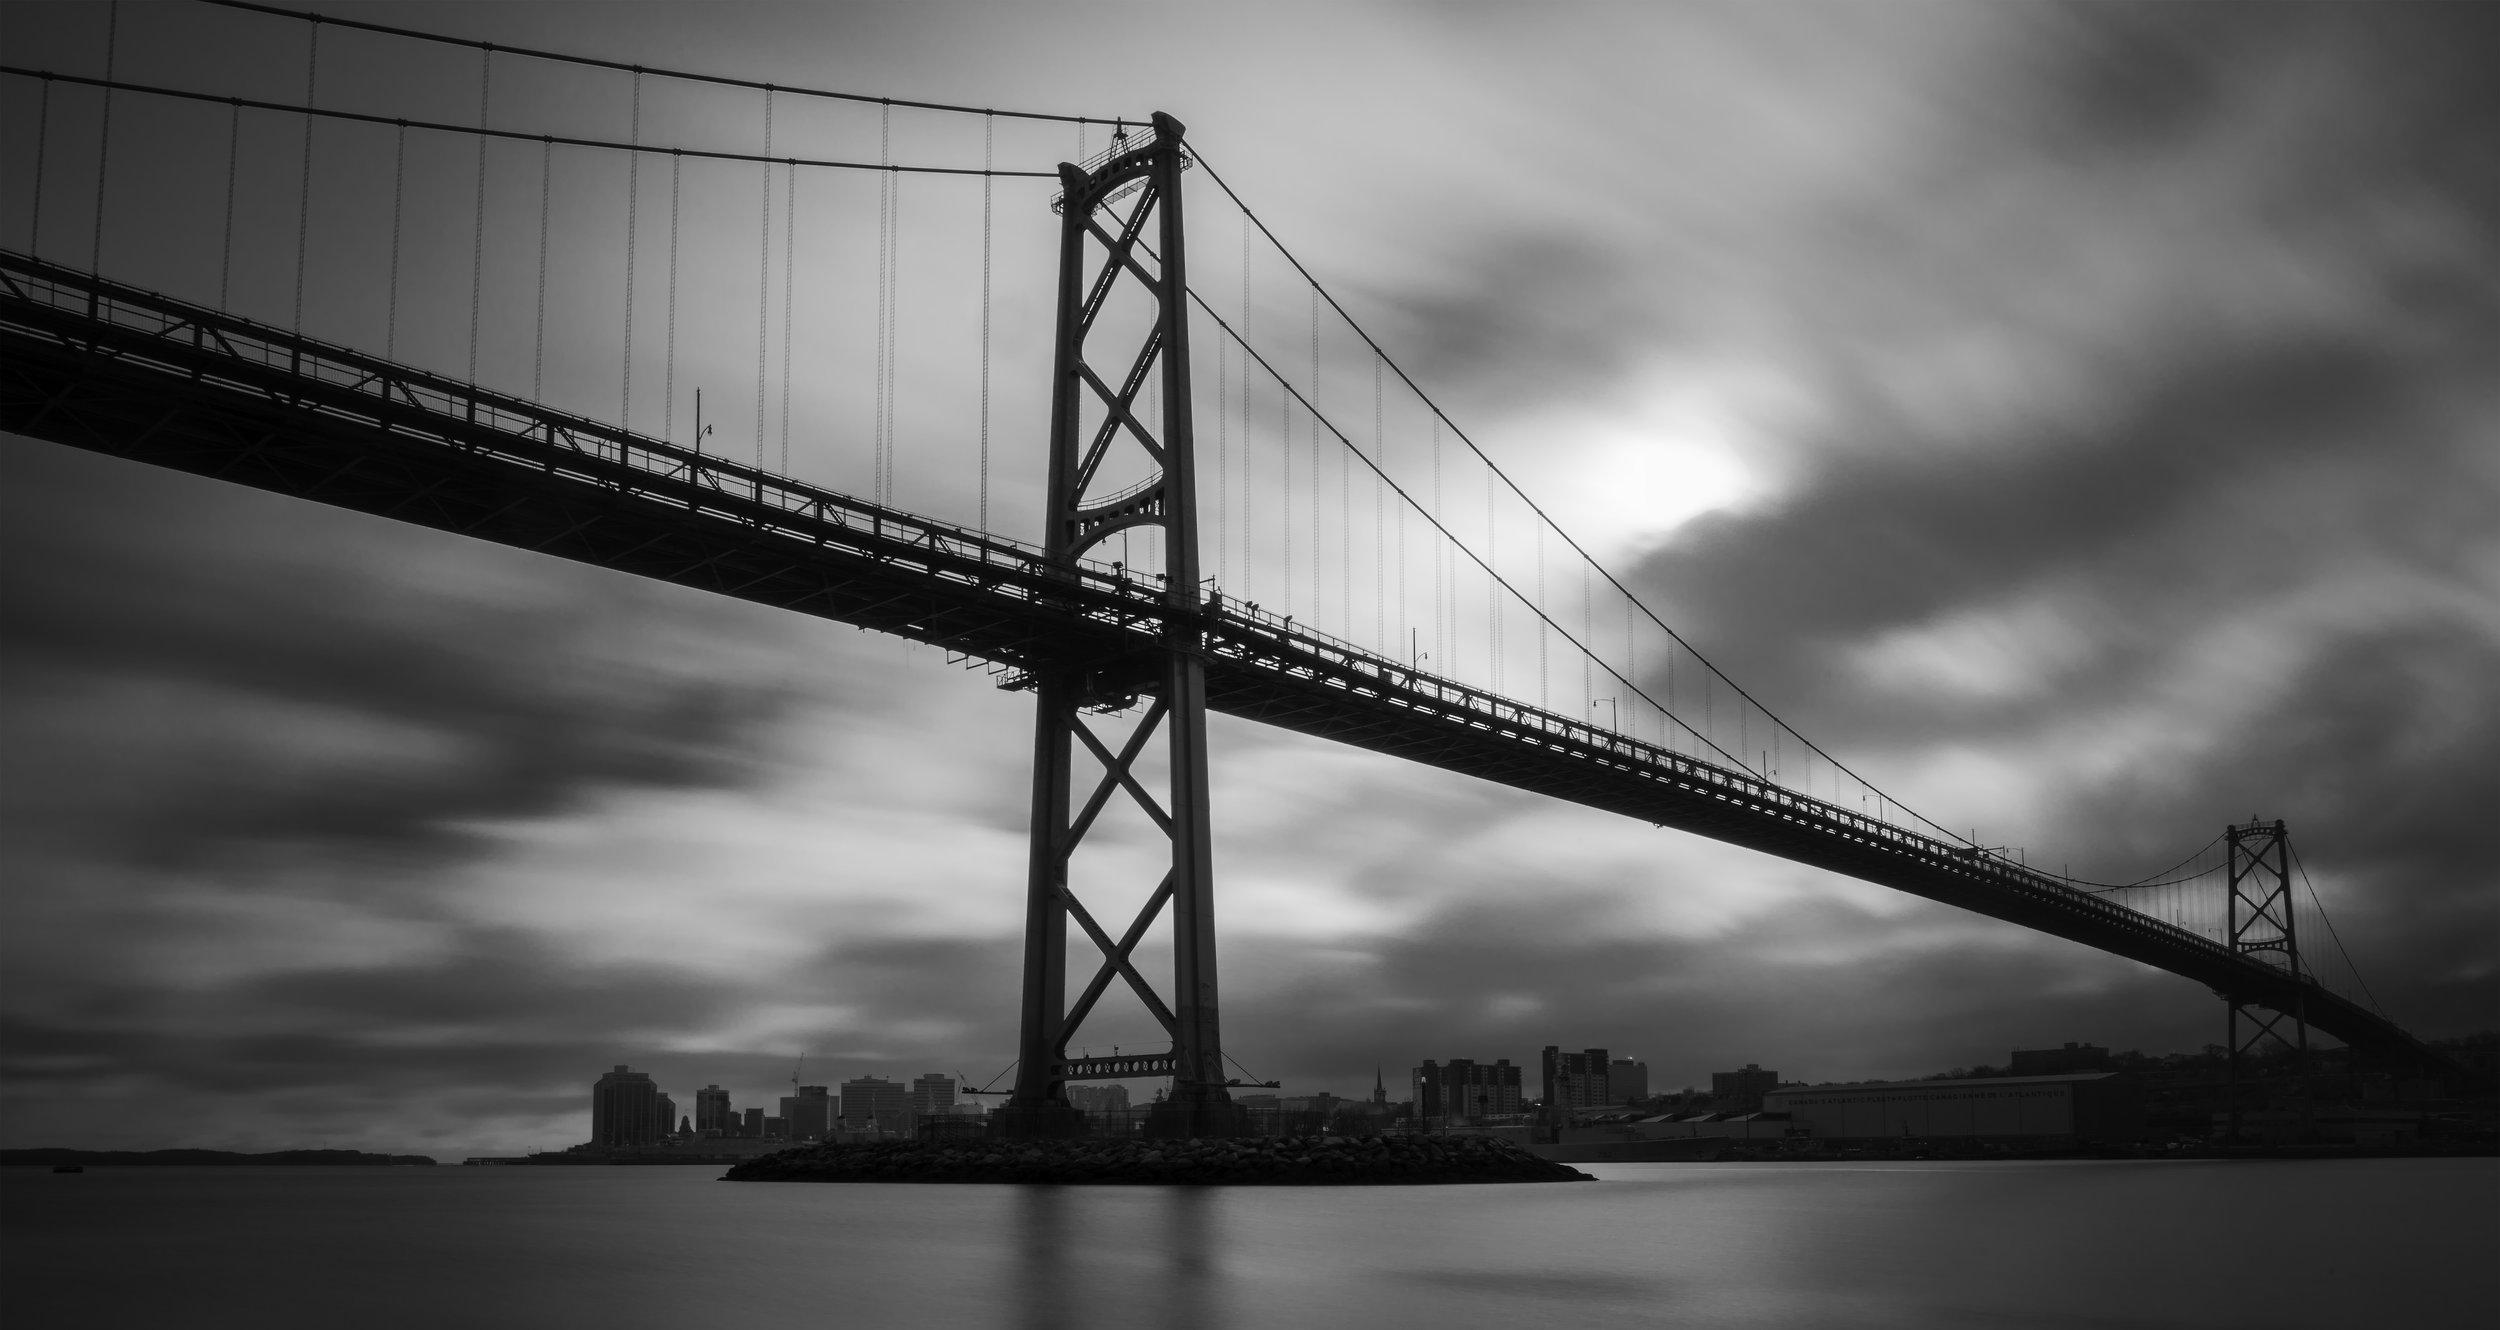 Bridgecanvas1224.jpg